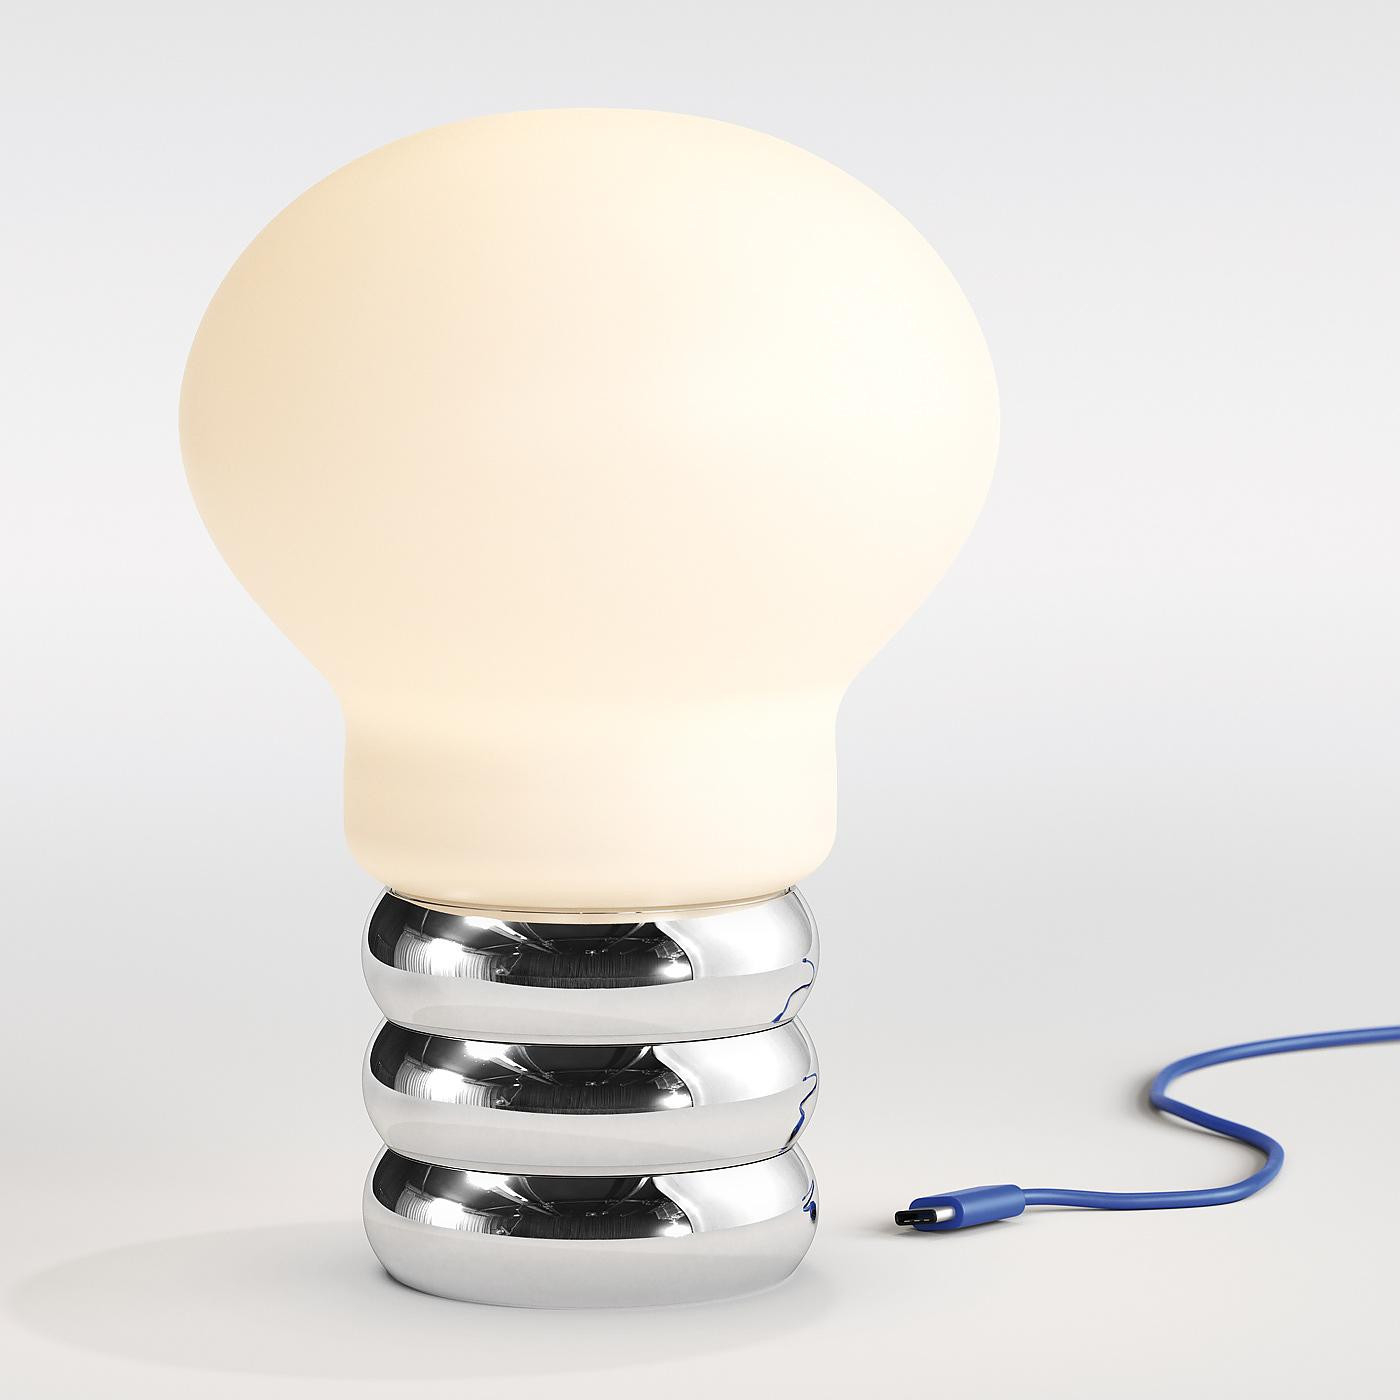 Ingo Maurer - b.bulb